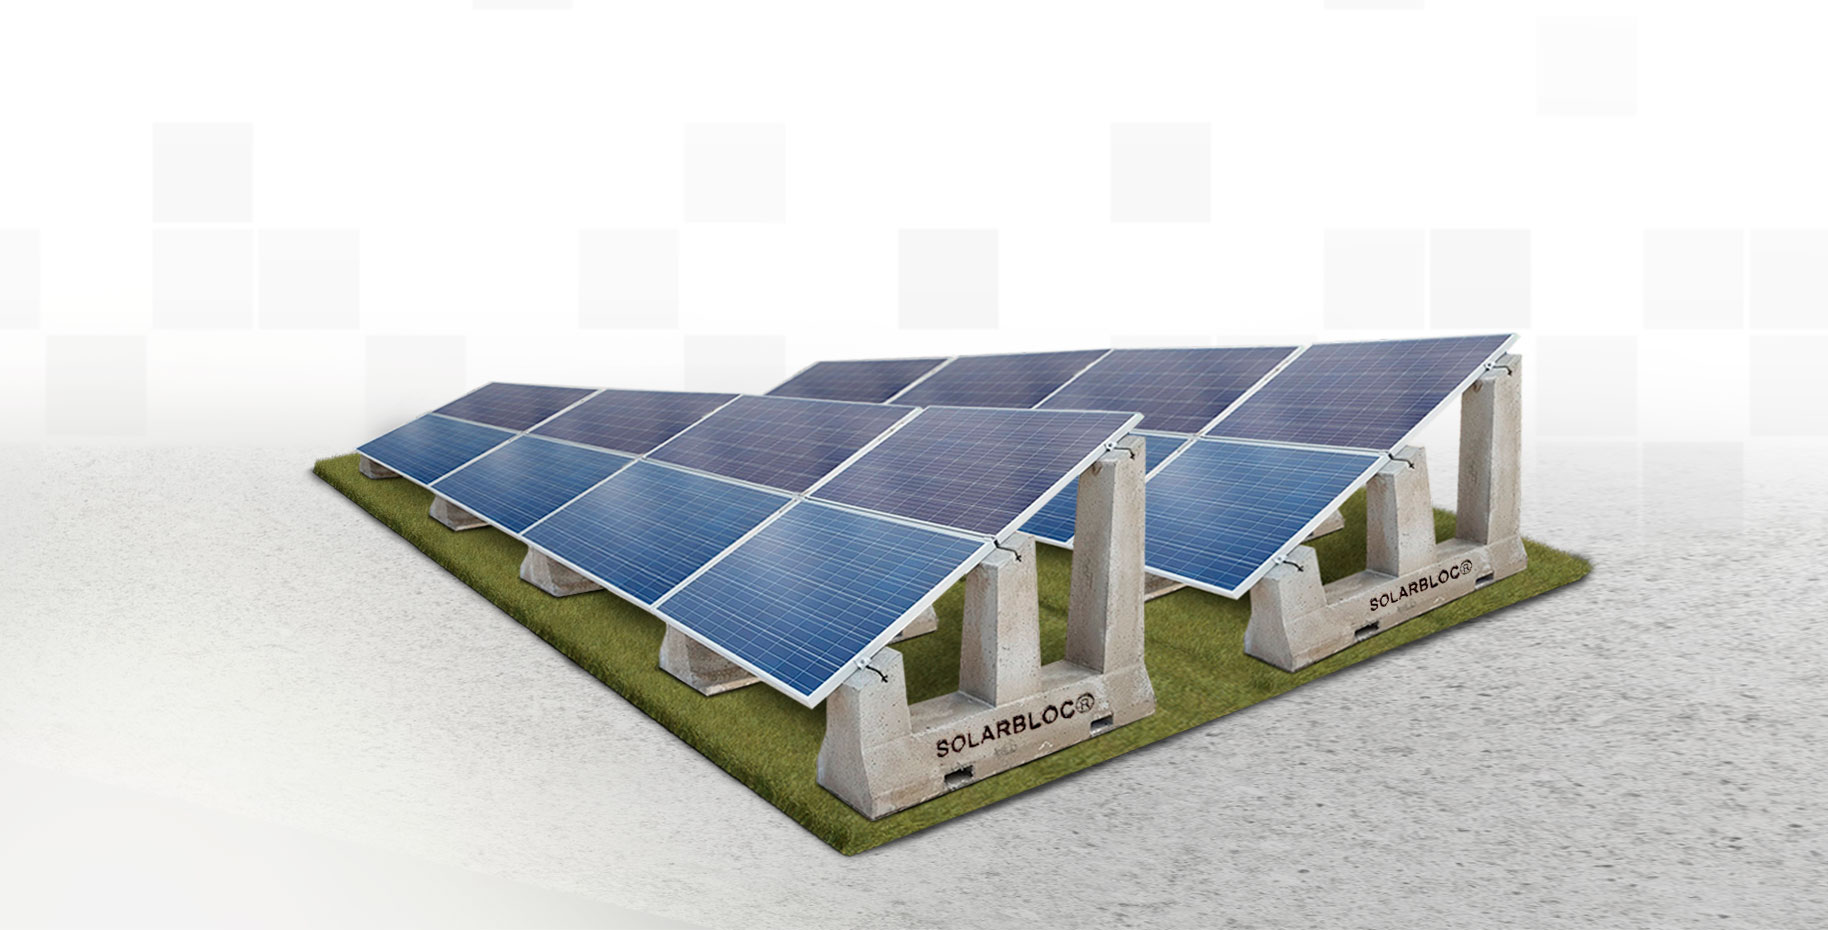 Estructura soporte paneles solares SOLARBLOC